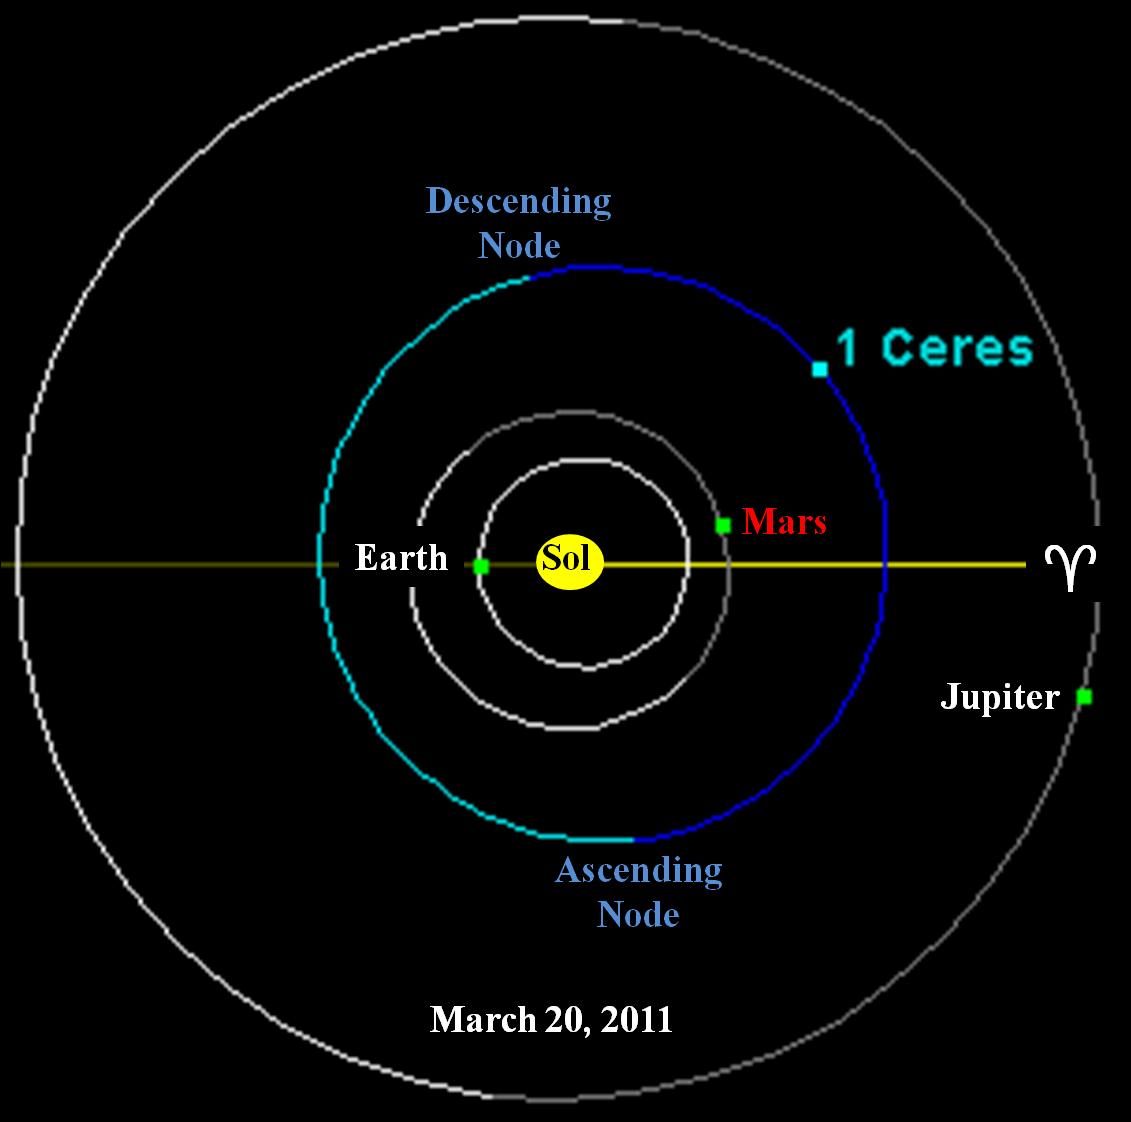 dwarf planet eris symbol - photo #20